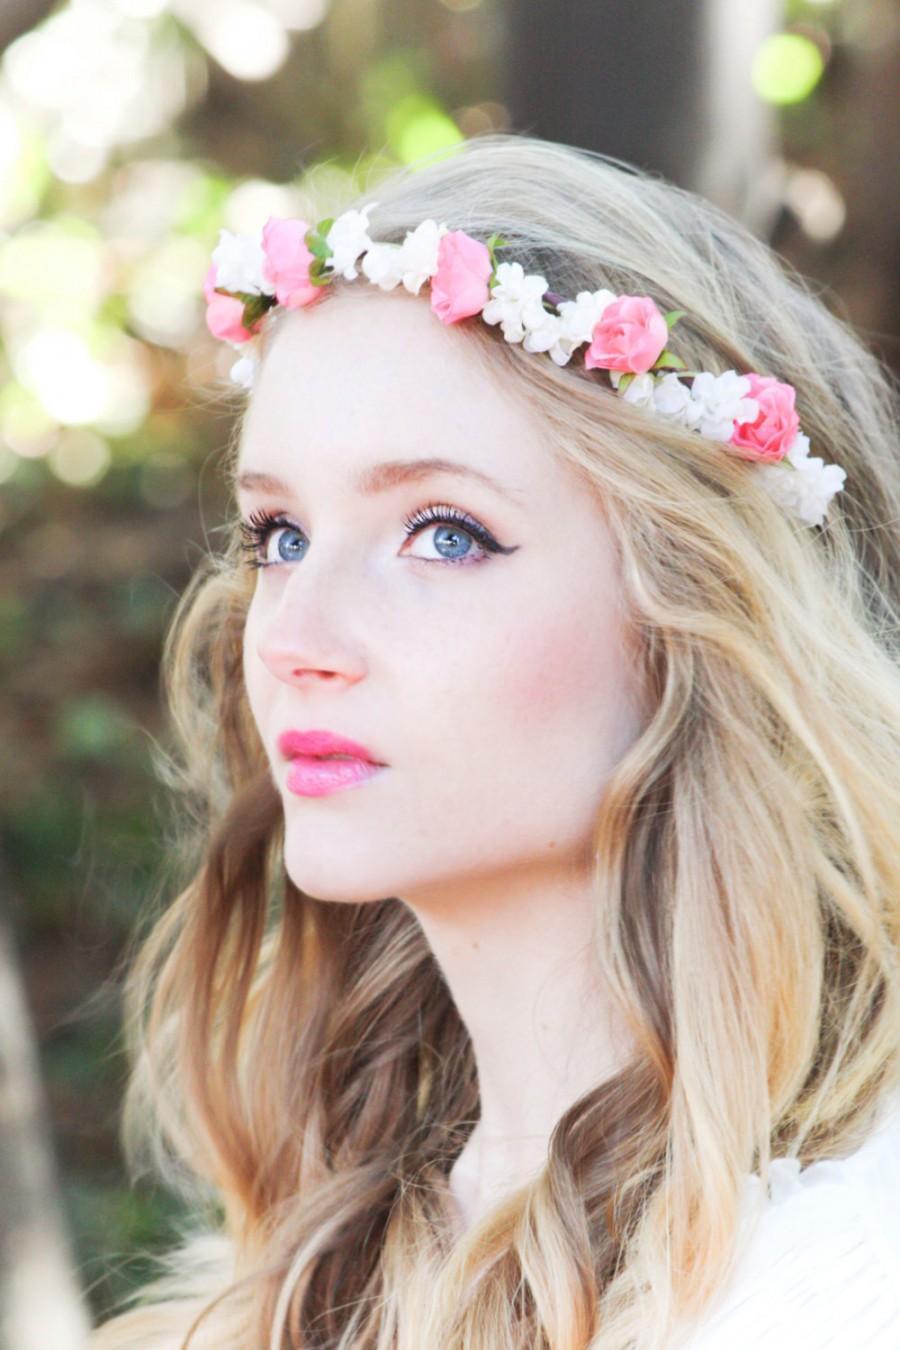 Wedding Flower Bridal Hair Accessory Pink Roses Hair Wreath Silk